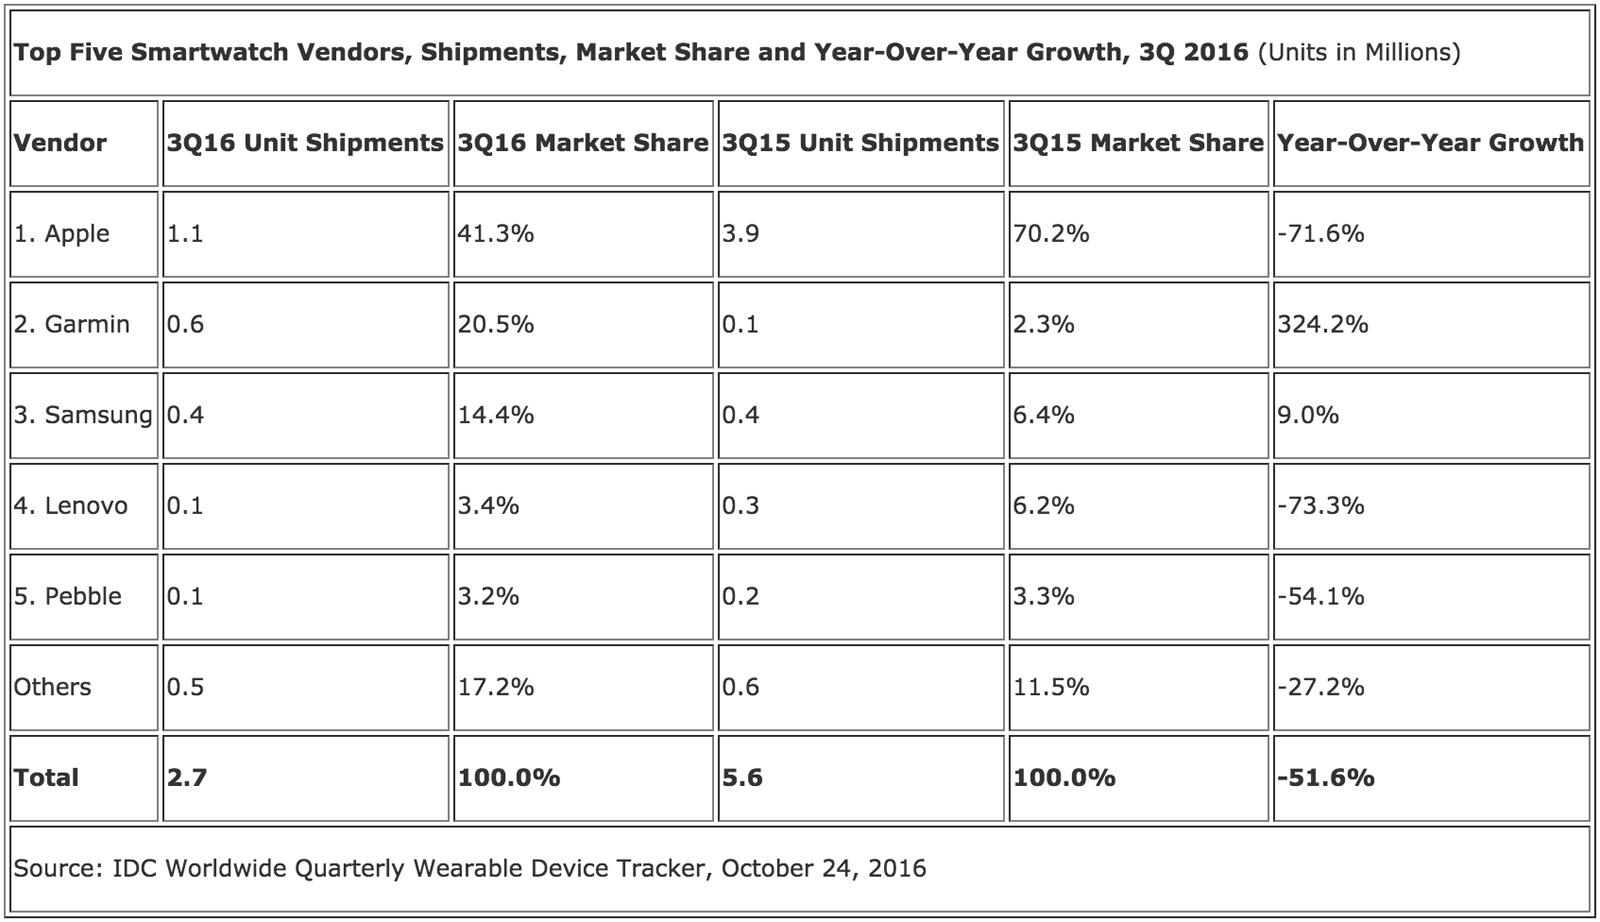 IDC's smartwatch market share estimates for Q3 2016